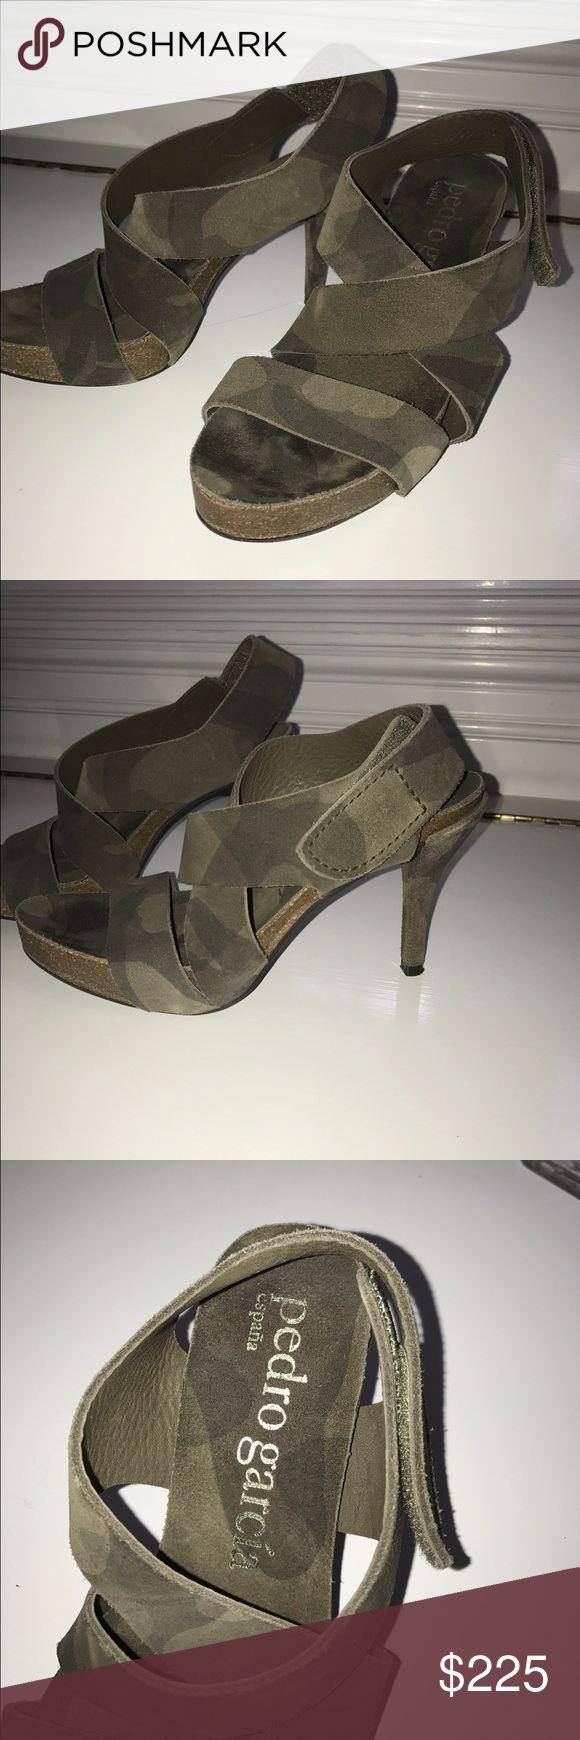 Pedro Garcia espana heels Pedro Garcia Lynna Espana suede high heels size 37 or 7! Gently used. Great condition! Super cute ❤️ made in Spain. Olive/camo color pedro garcia Shoes Heels